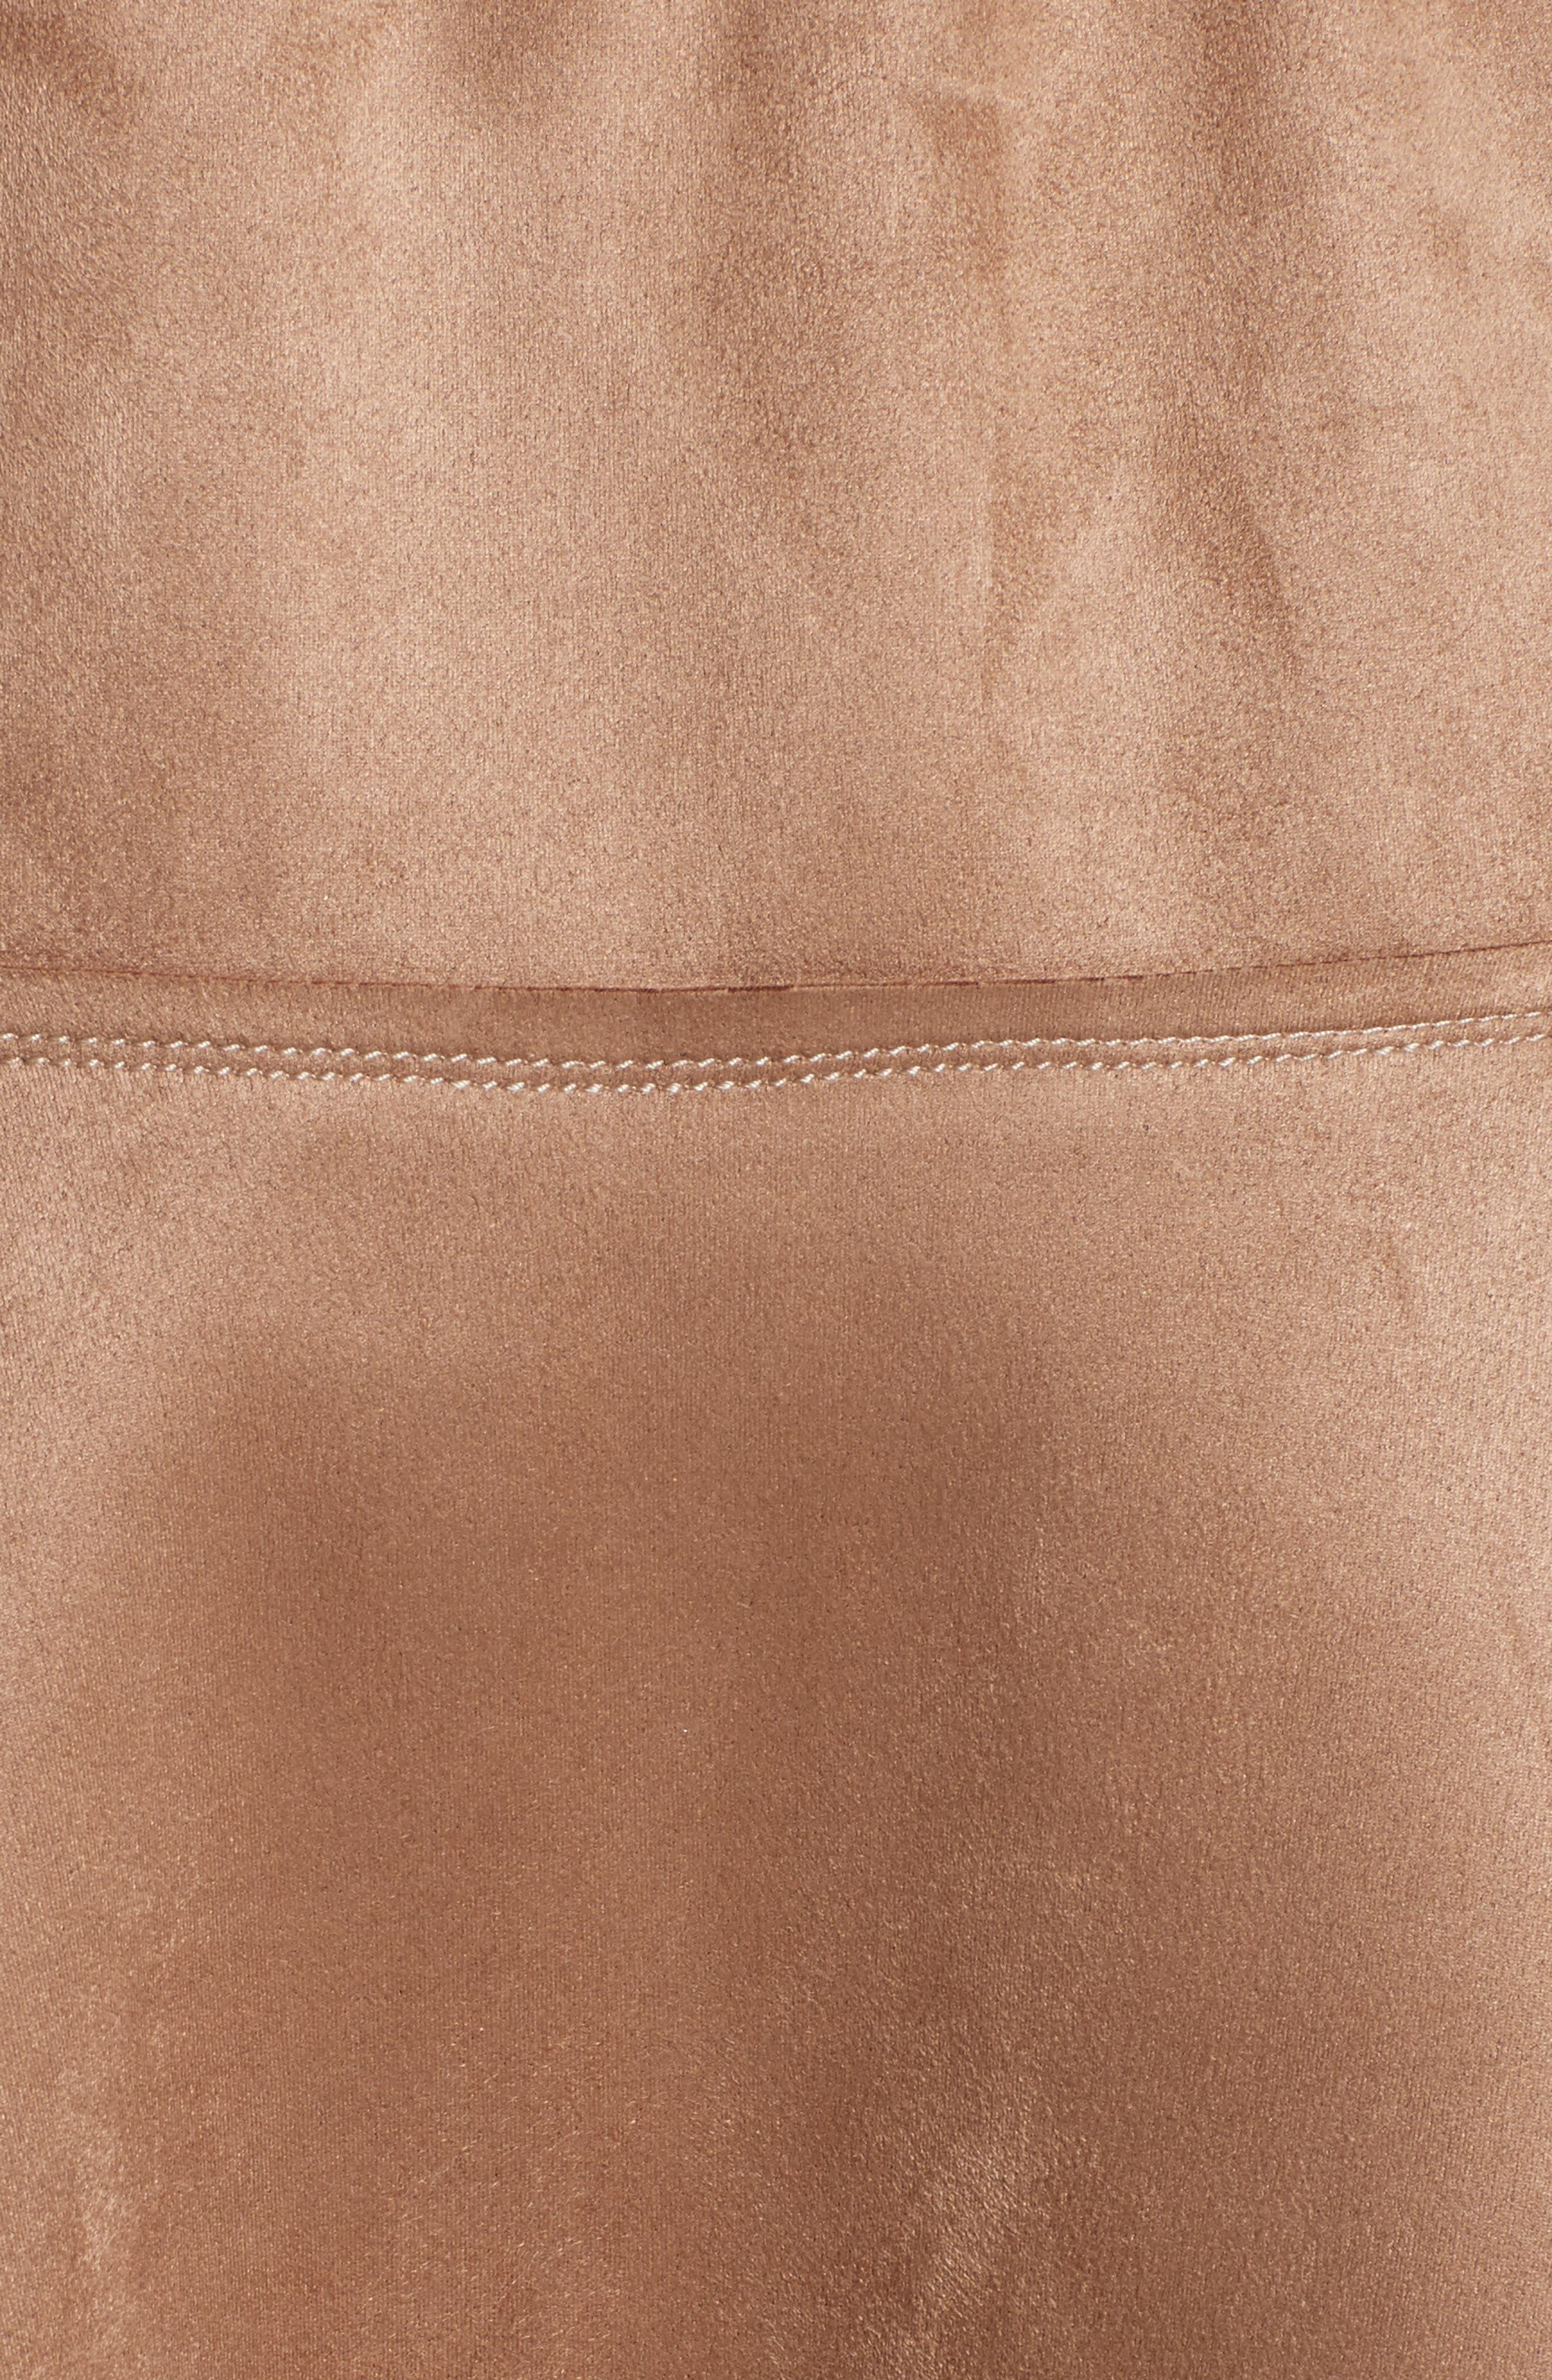 Metallic Midi Skirt,                             Alternate thumbnail 5, color,                             Dark Sand